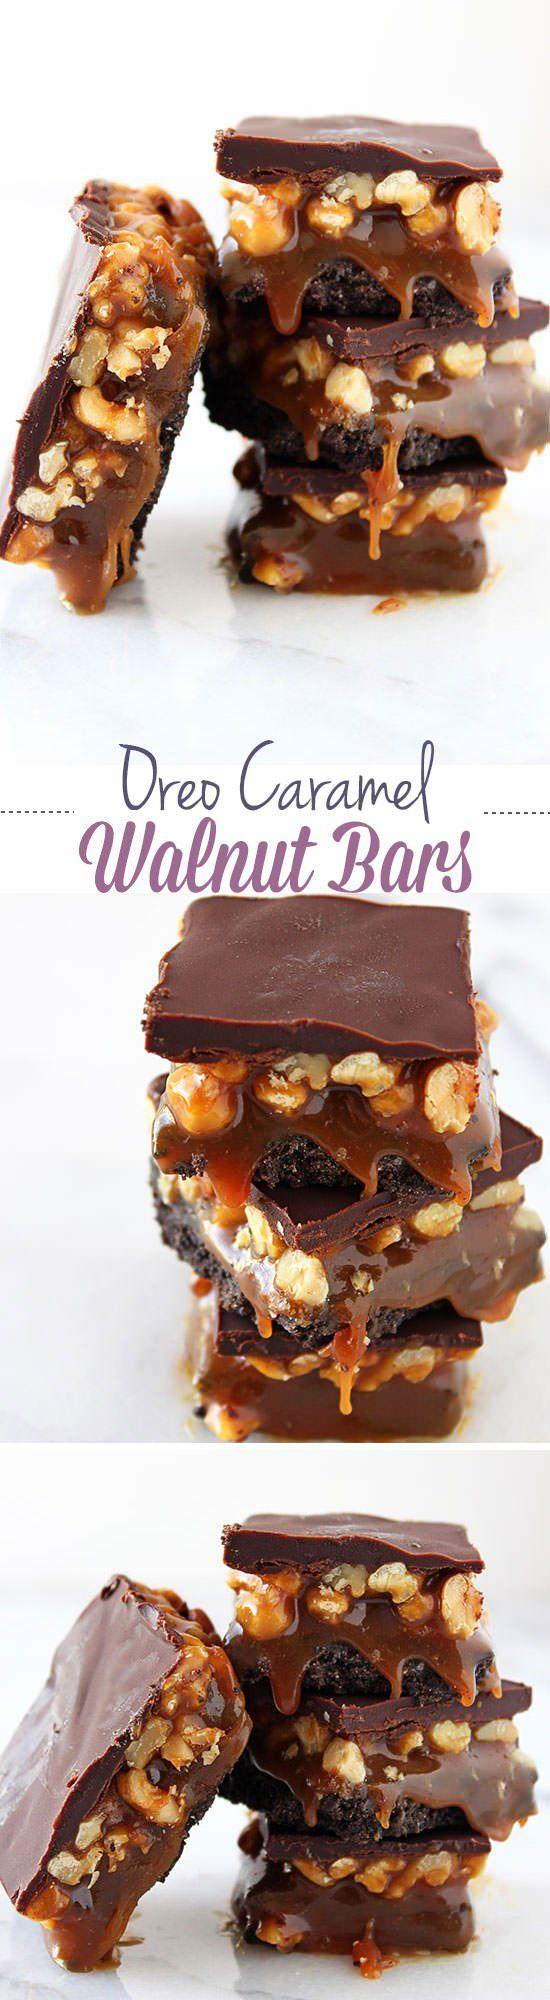 Oreo Caramel Walnut Bars - one of the BEST desserts ever!!